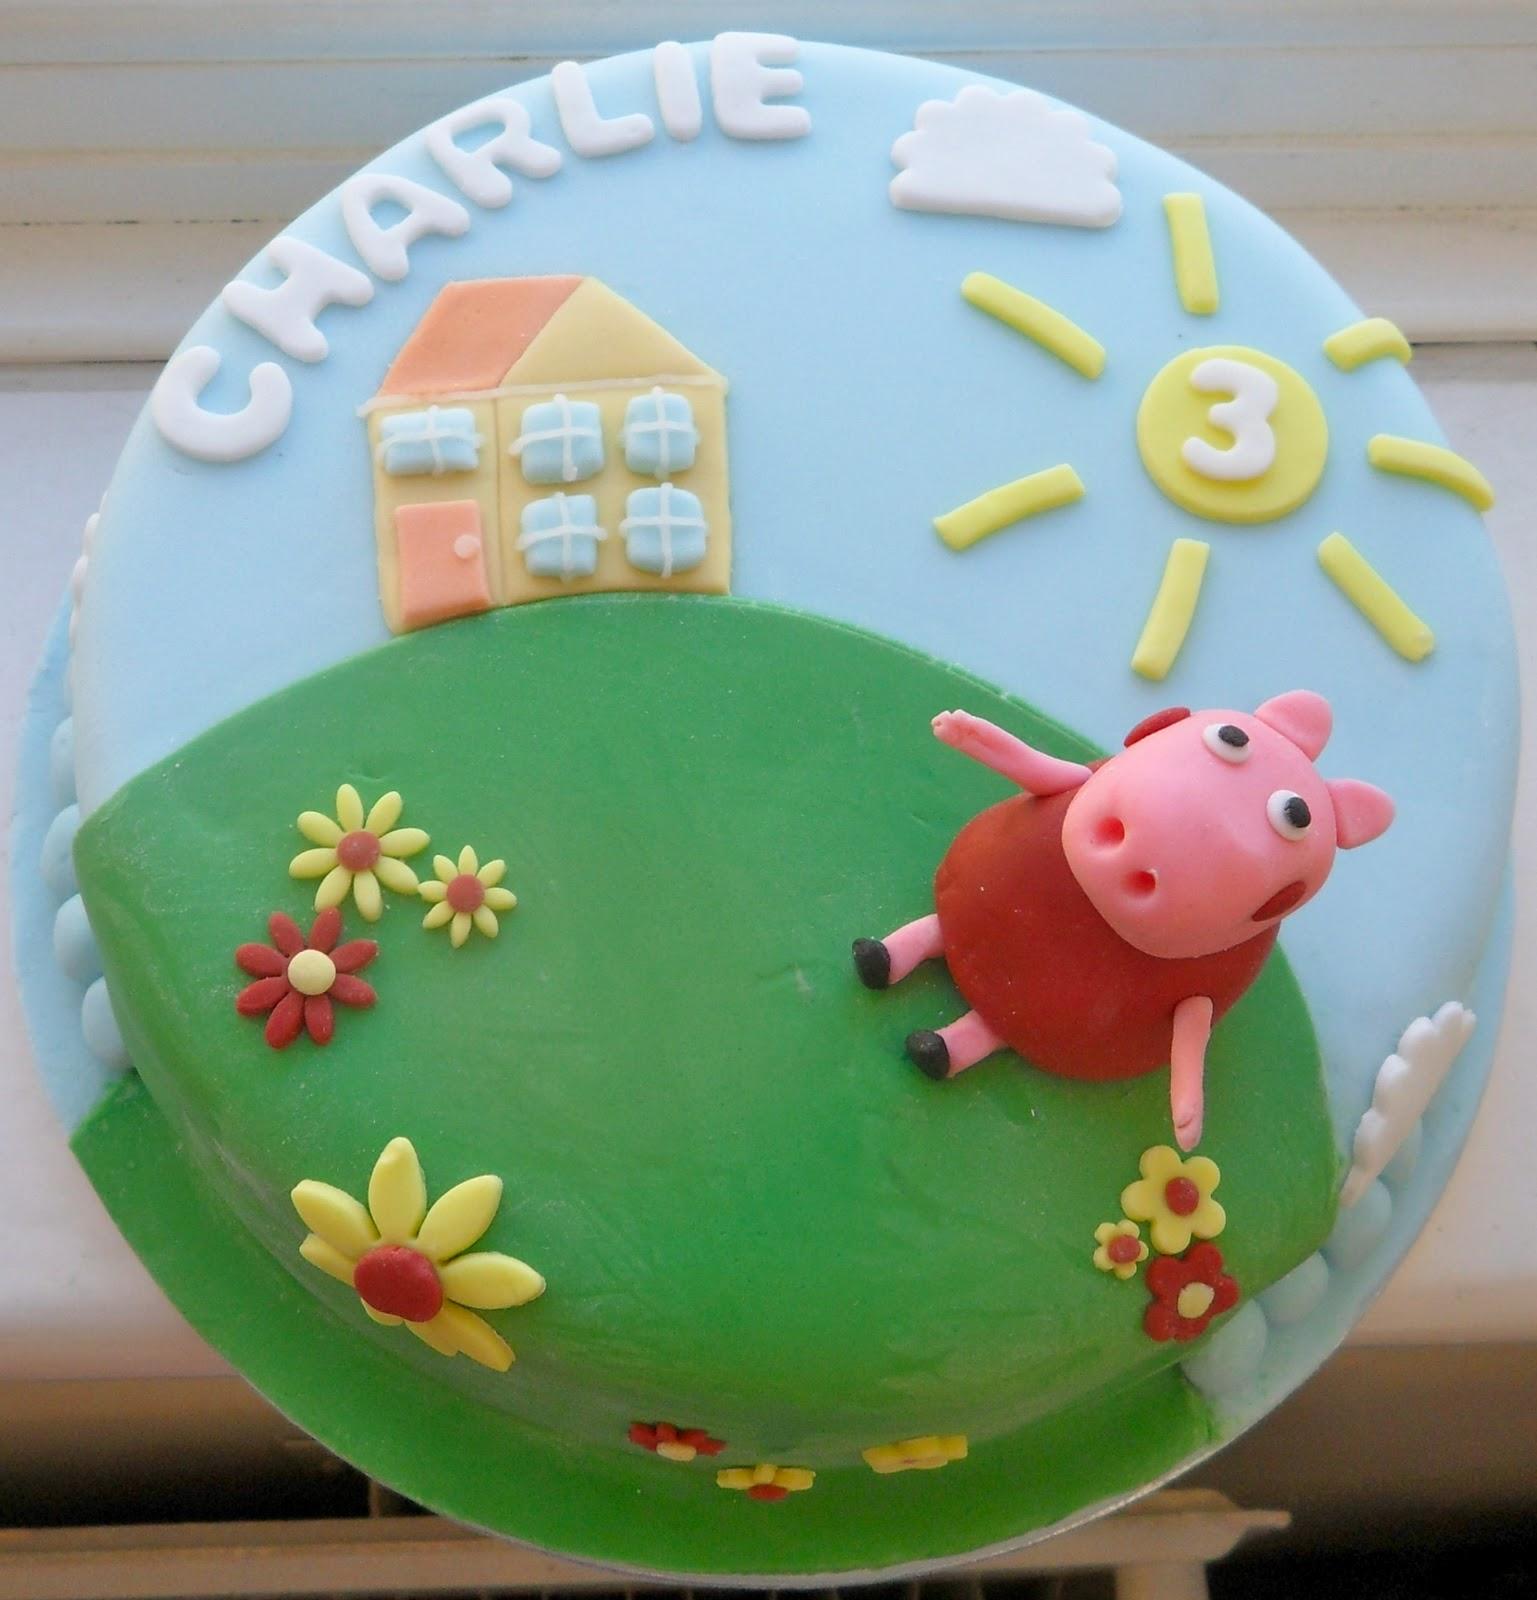 Cake Decorations  U Maidstone